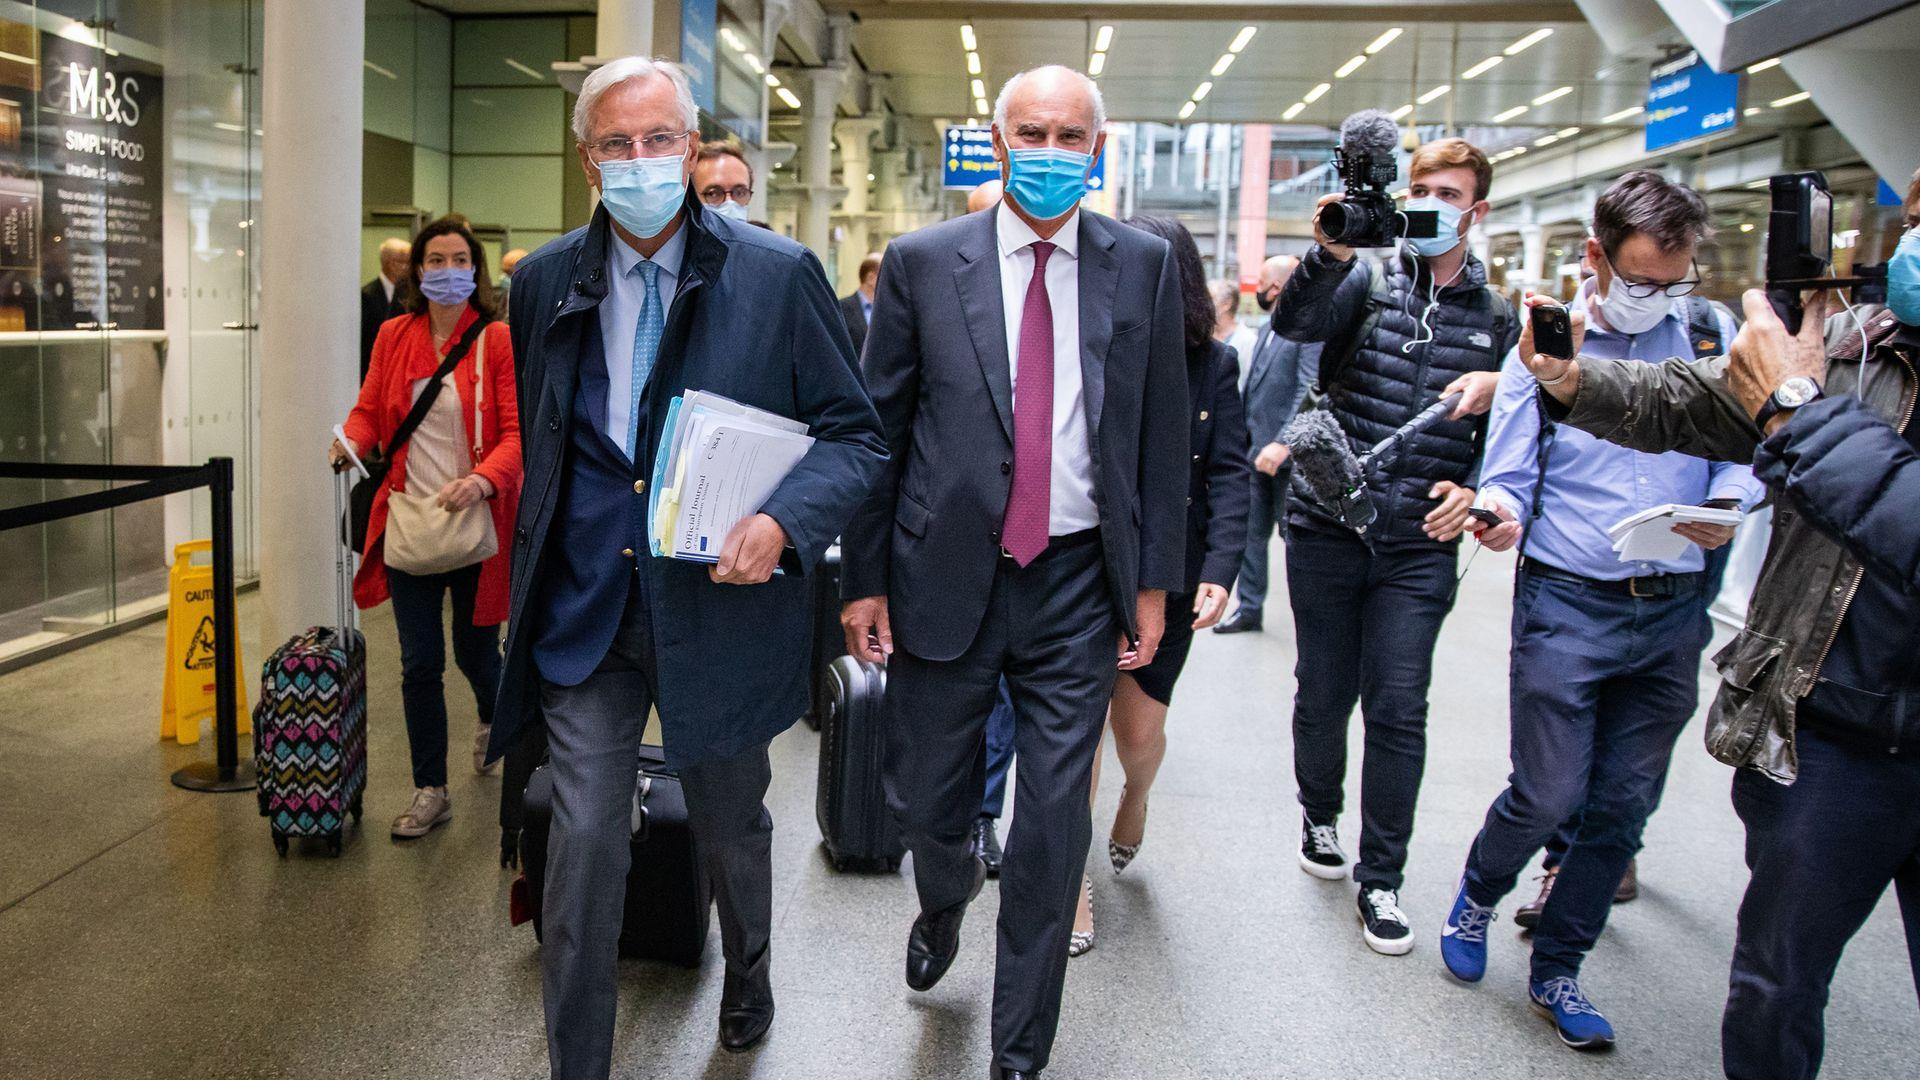 Ex-EU chief Brexit negotiator Michel Barnier (left) arriving from the Eurostar with then EU Ambassador to the UK, Portuguese diplomat Joao Vale de Almeida at St Pancras International railway station, London - Credit: PA